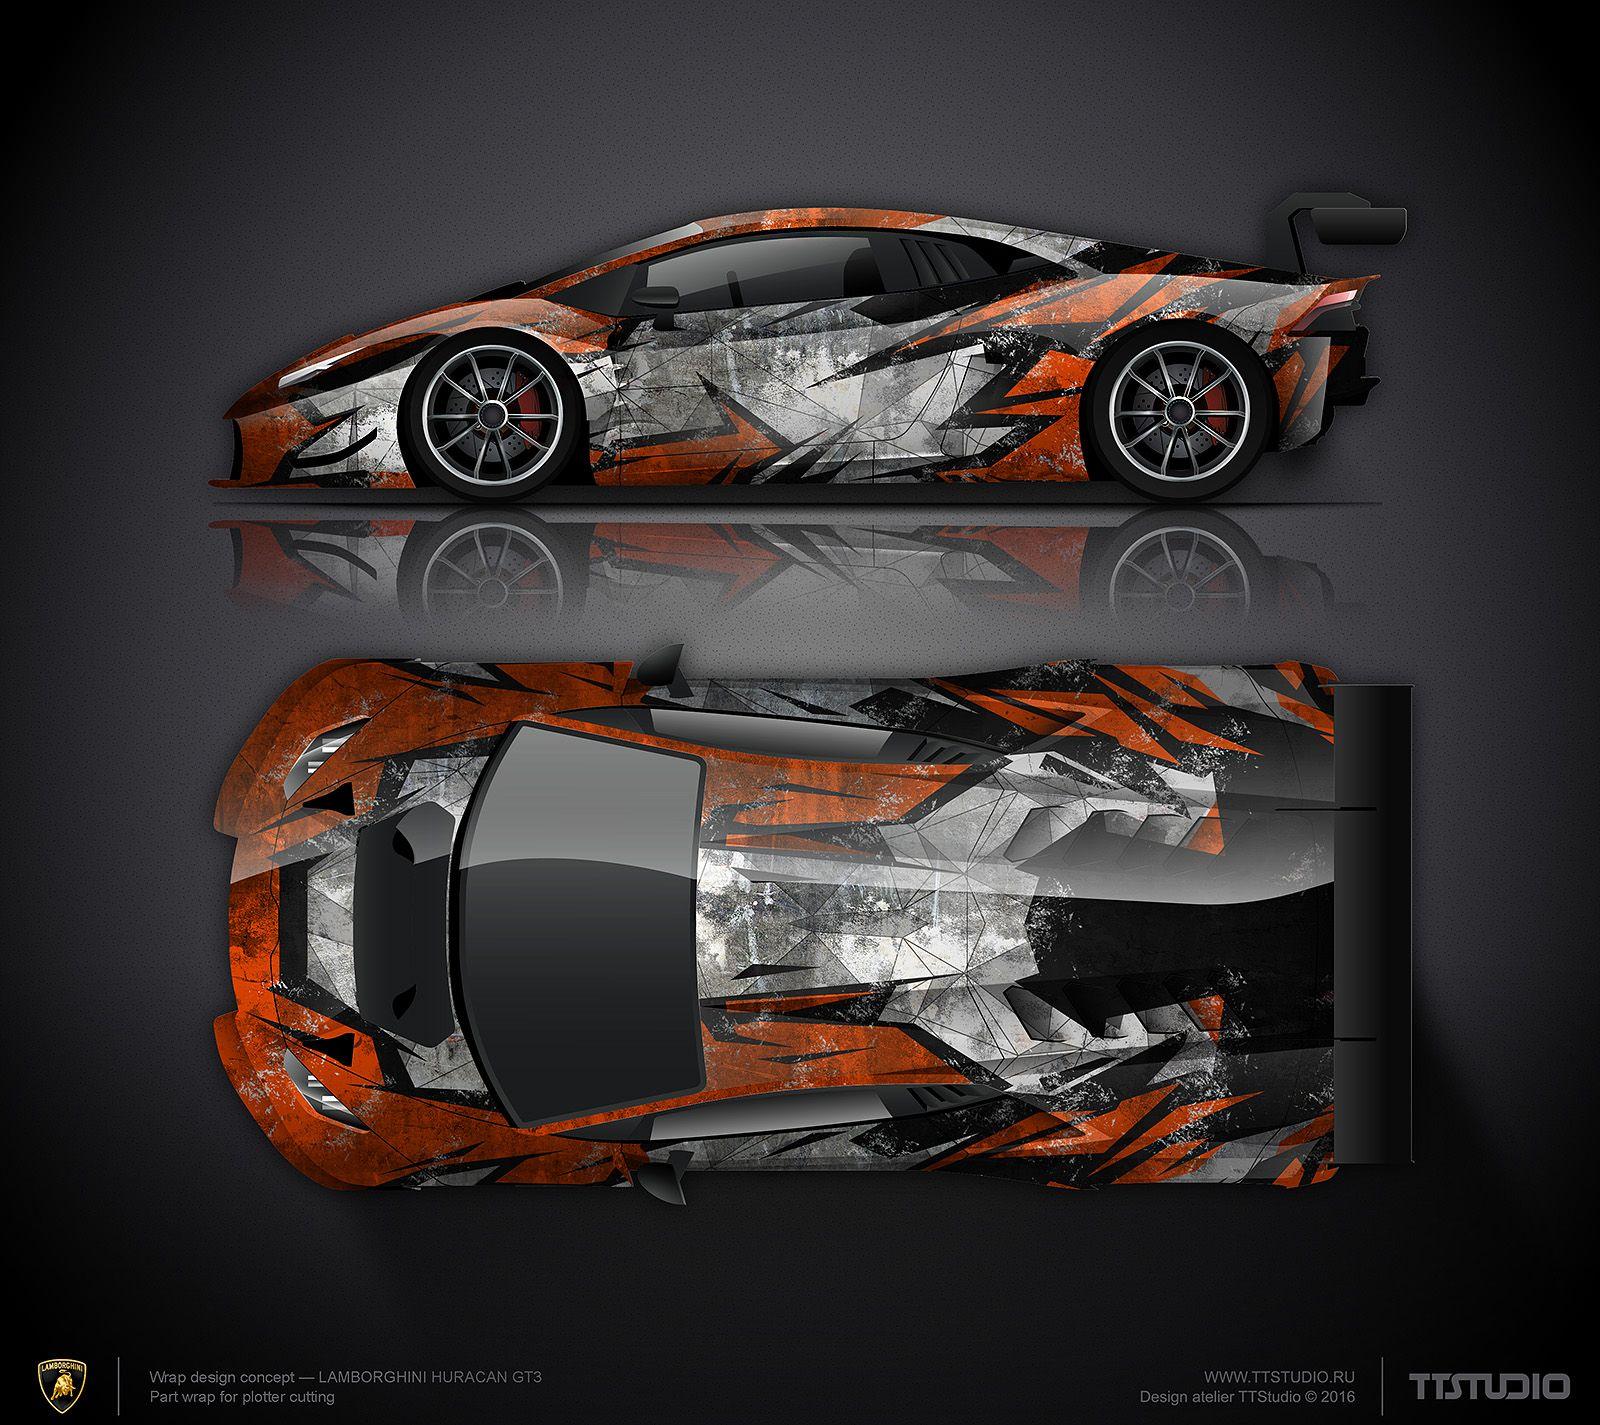 Car body sticker design for sale - Lambo Scratch Livery Design Atelier Ttstudio